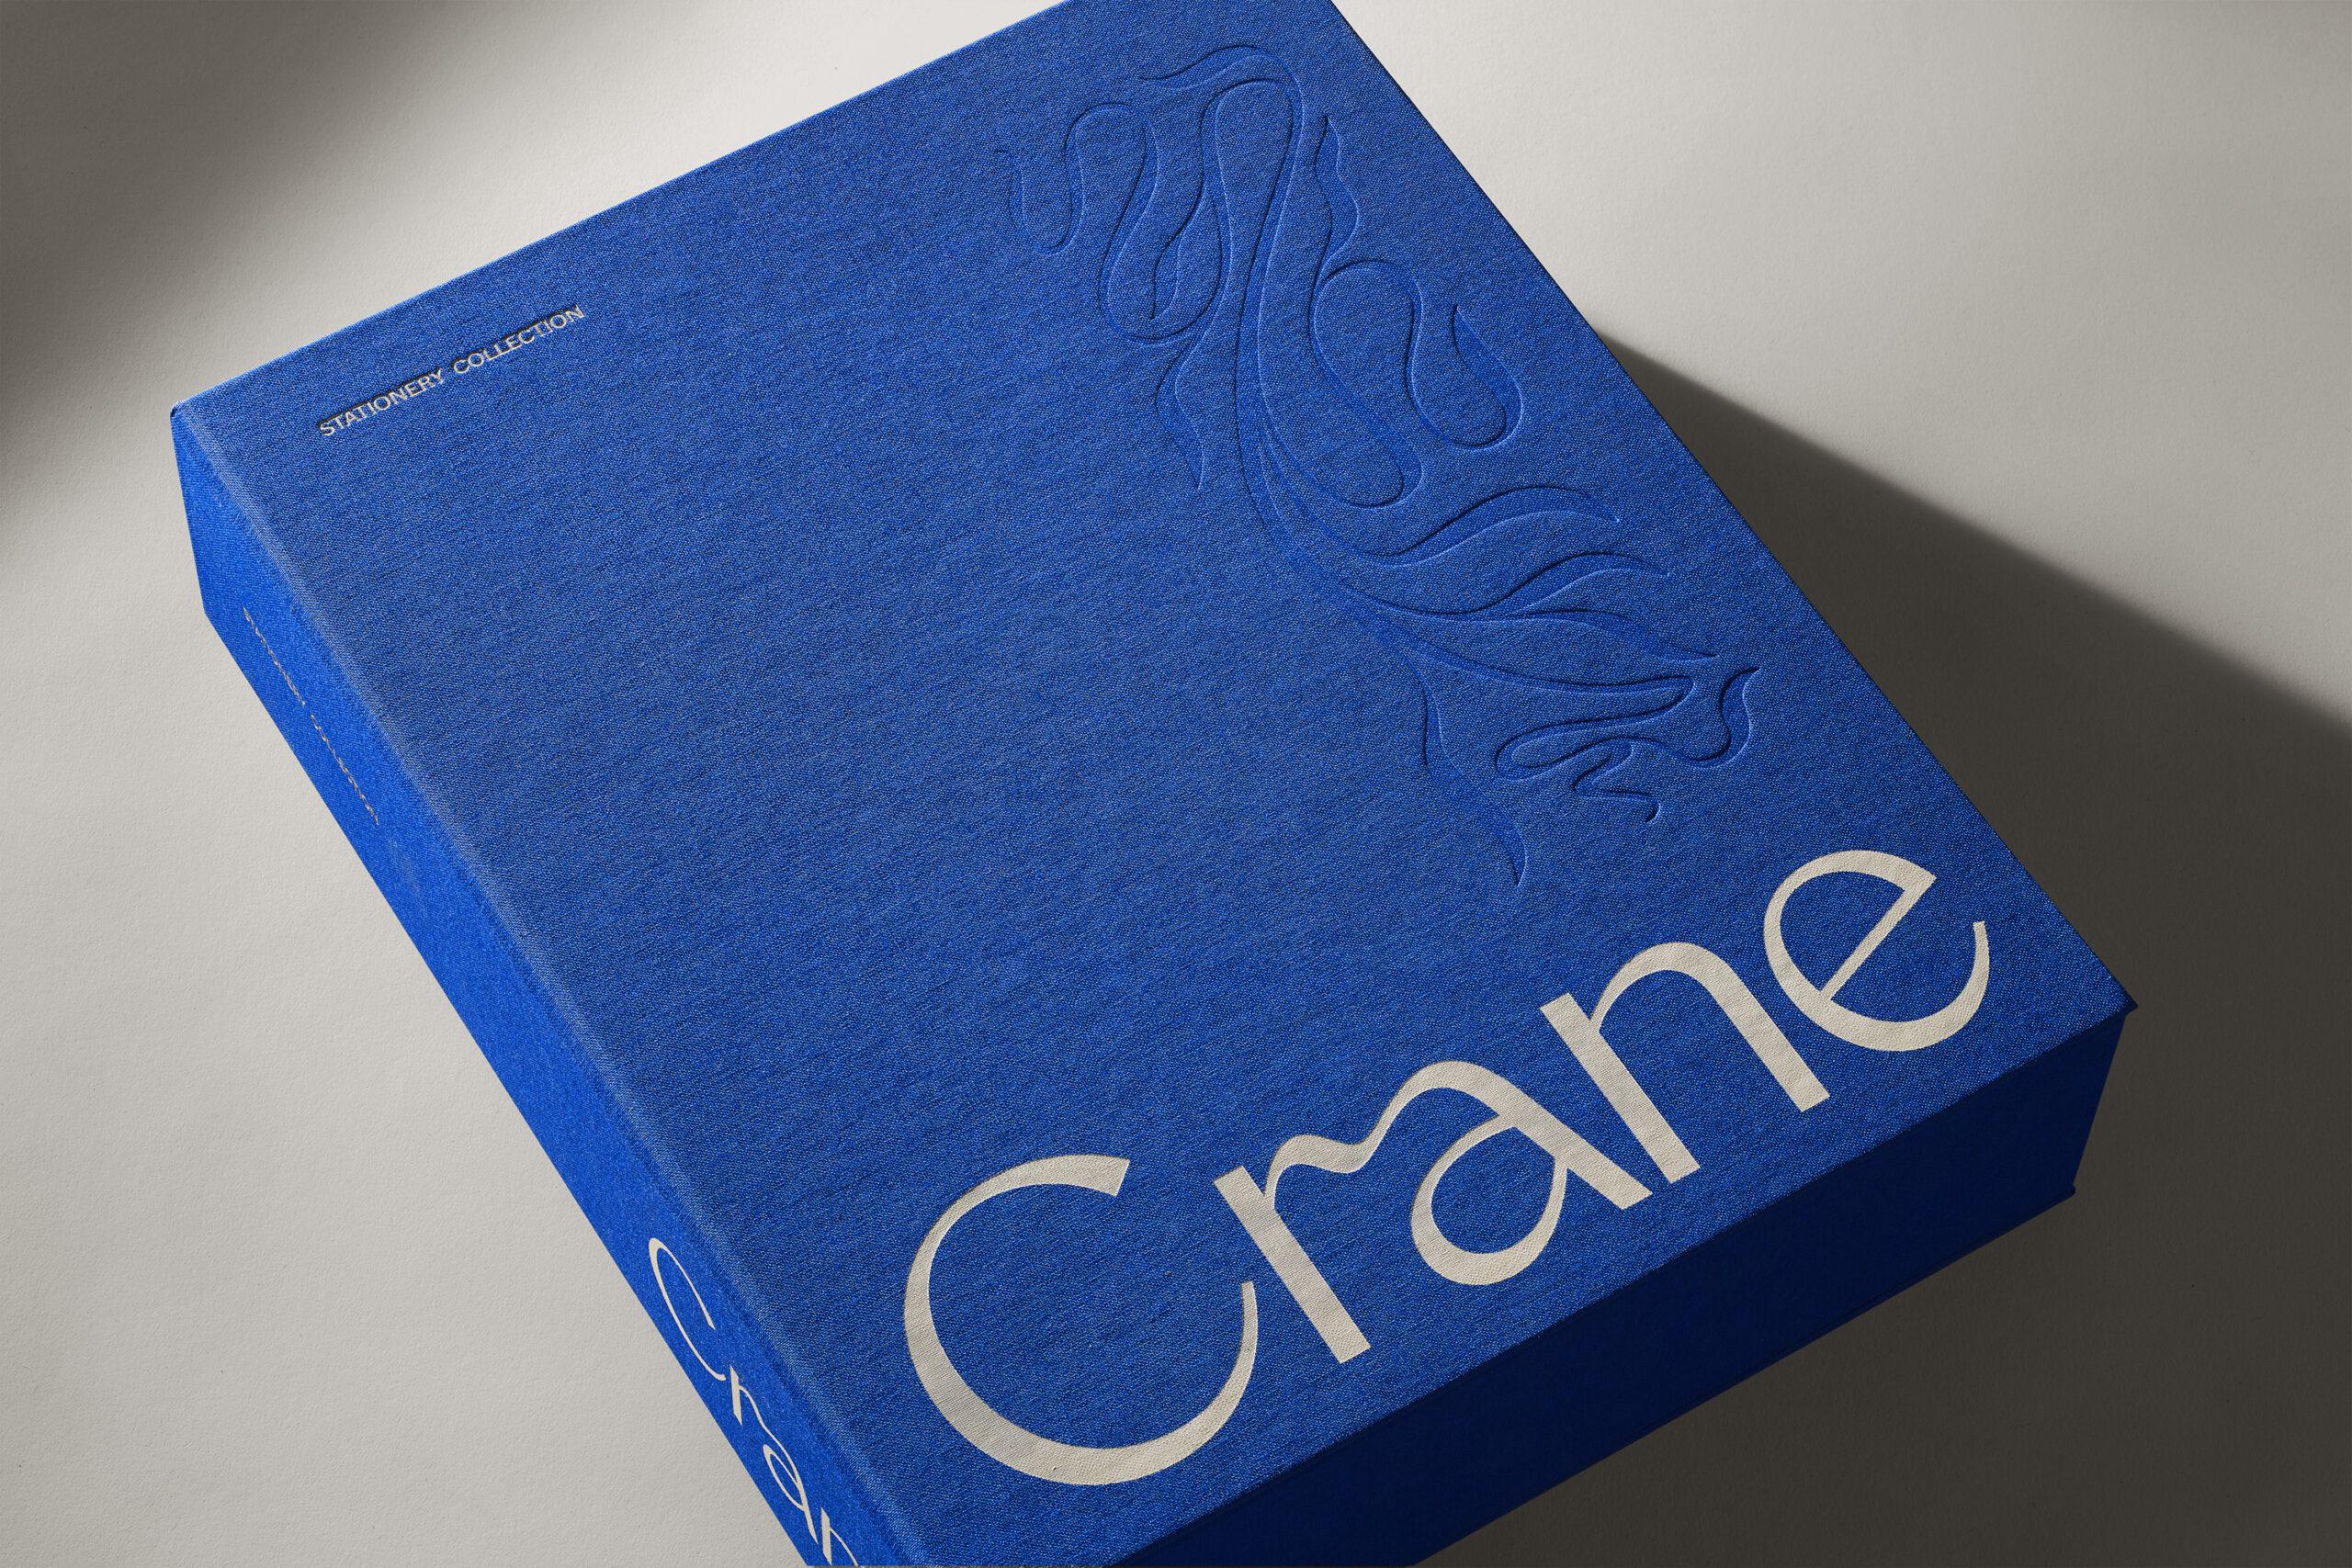 02-Crane-Blue-Box